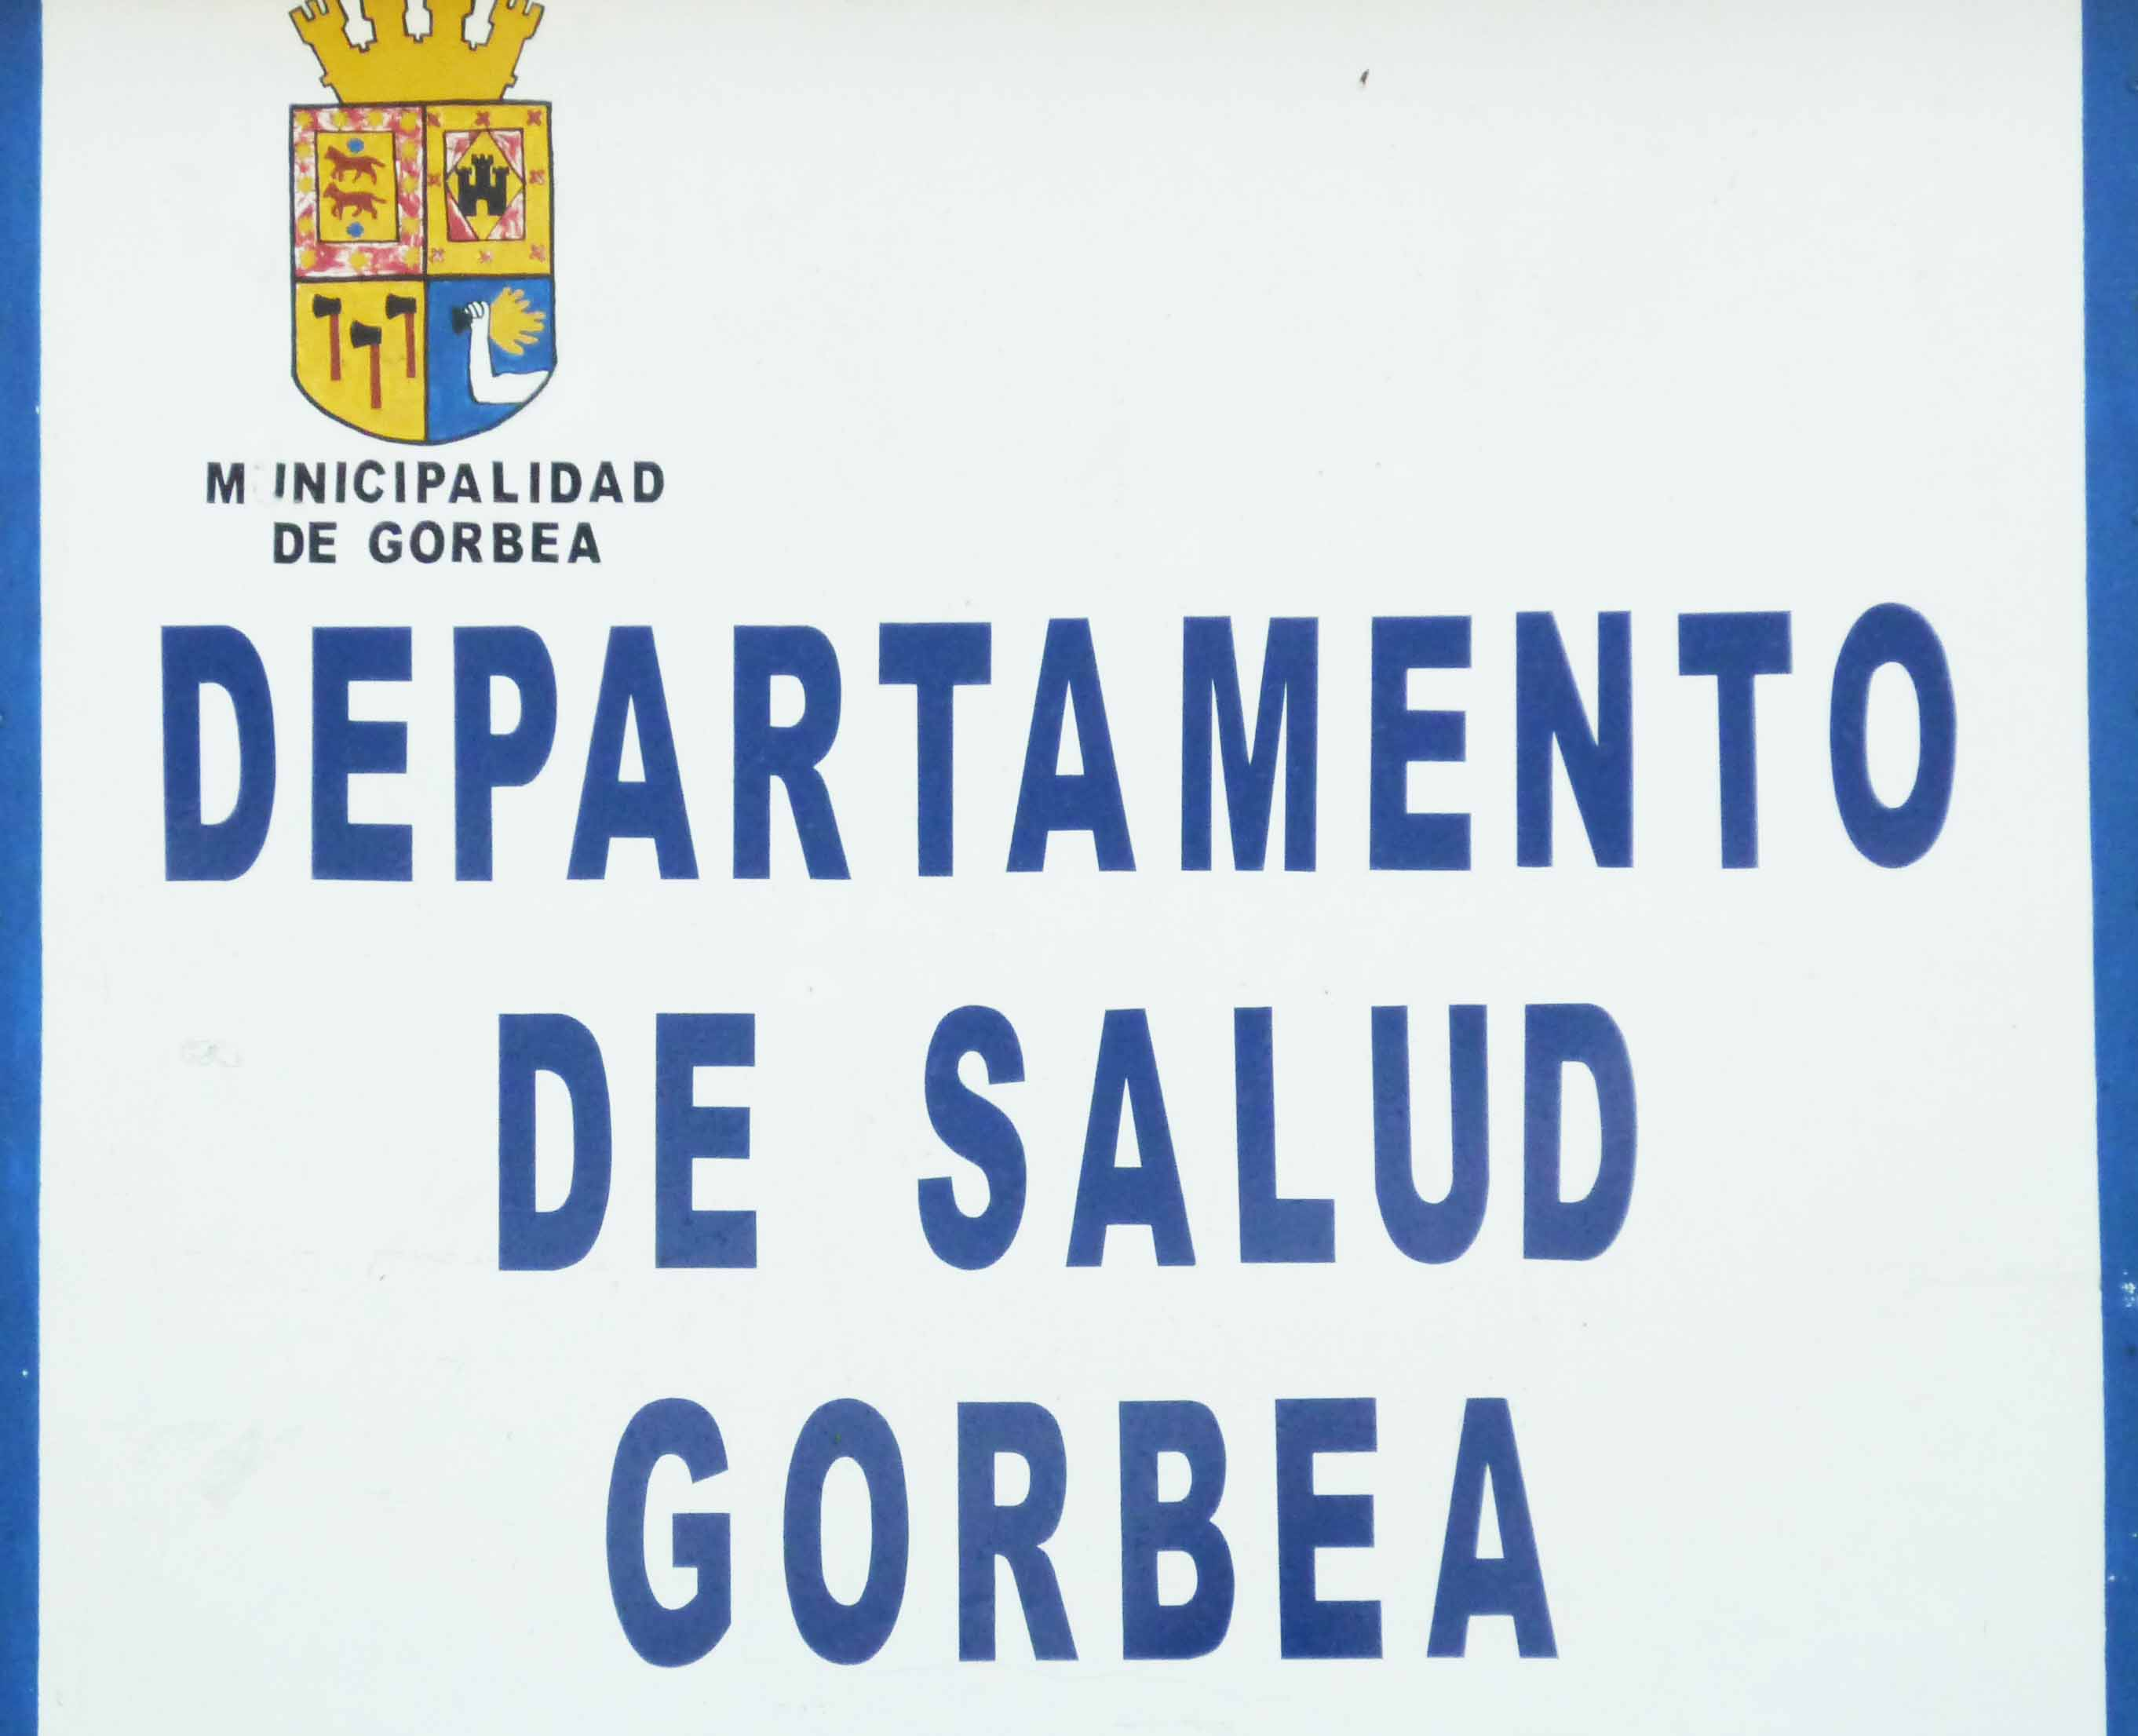 SALUD GORBEA